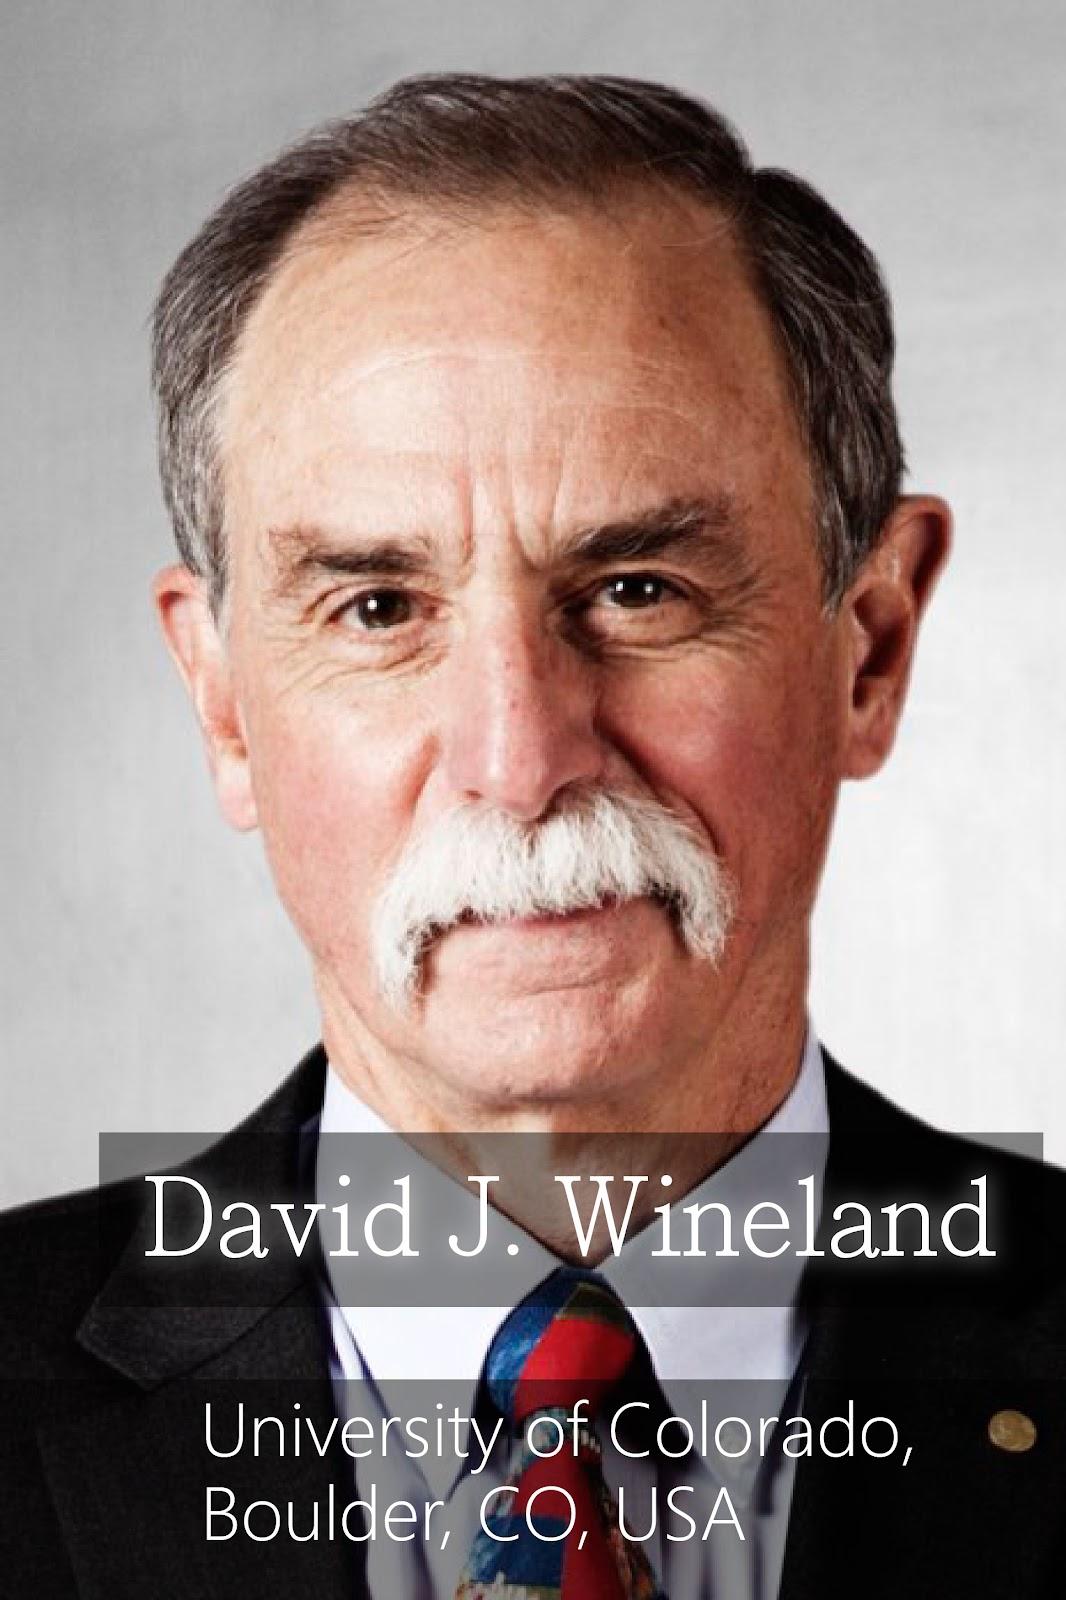 David J. Wineland - 2012 諾貝爾物理獎得主,證明量子纏繞是存在的